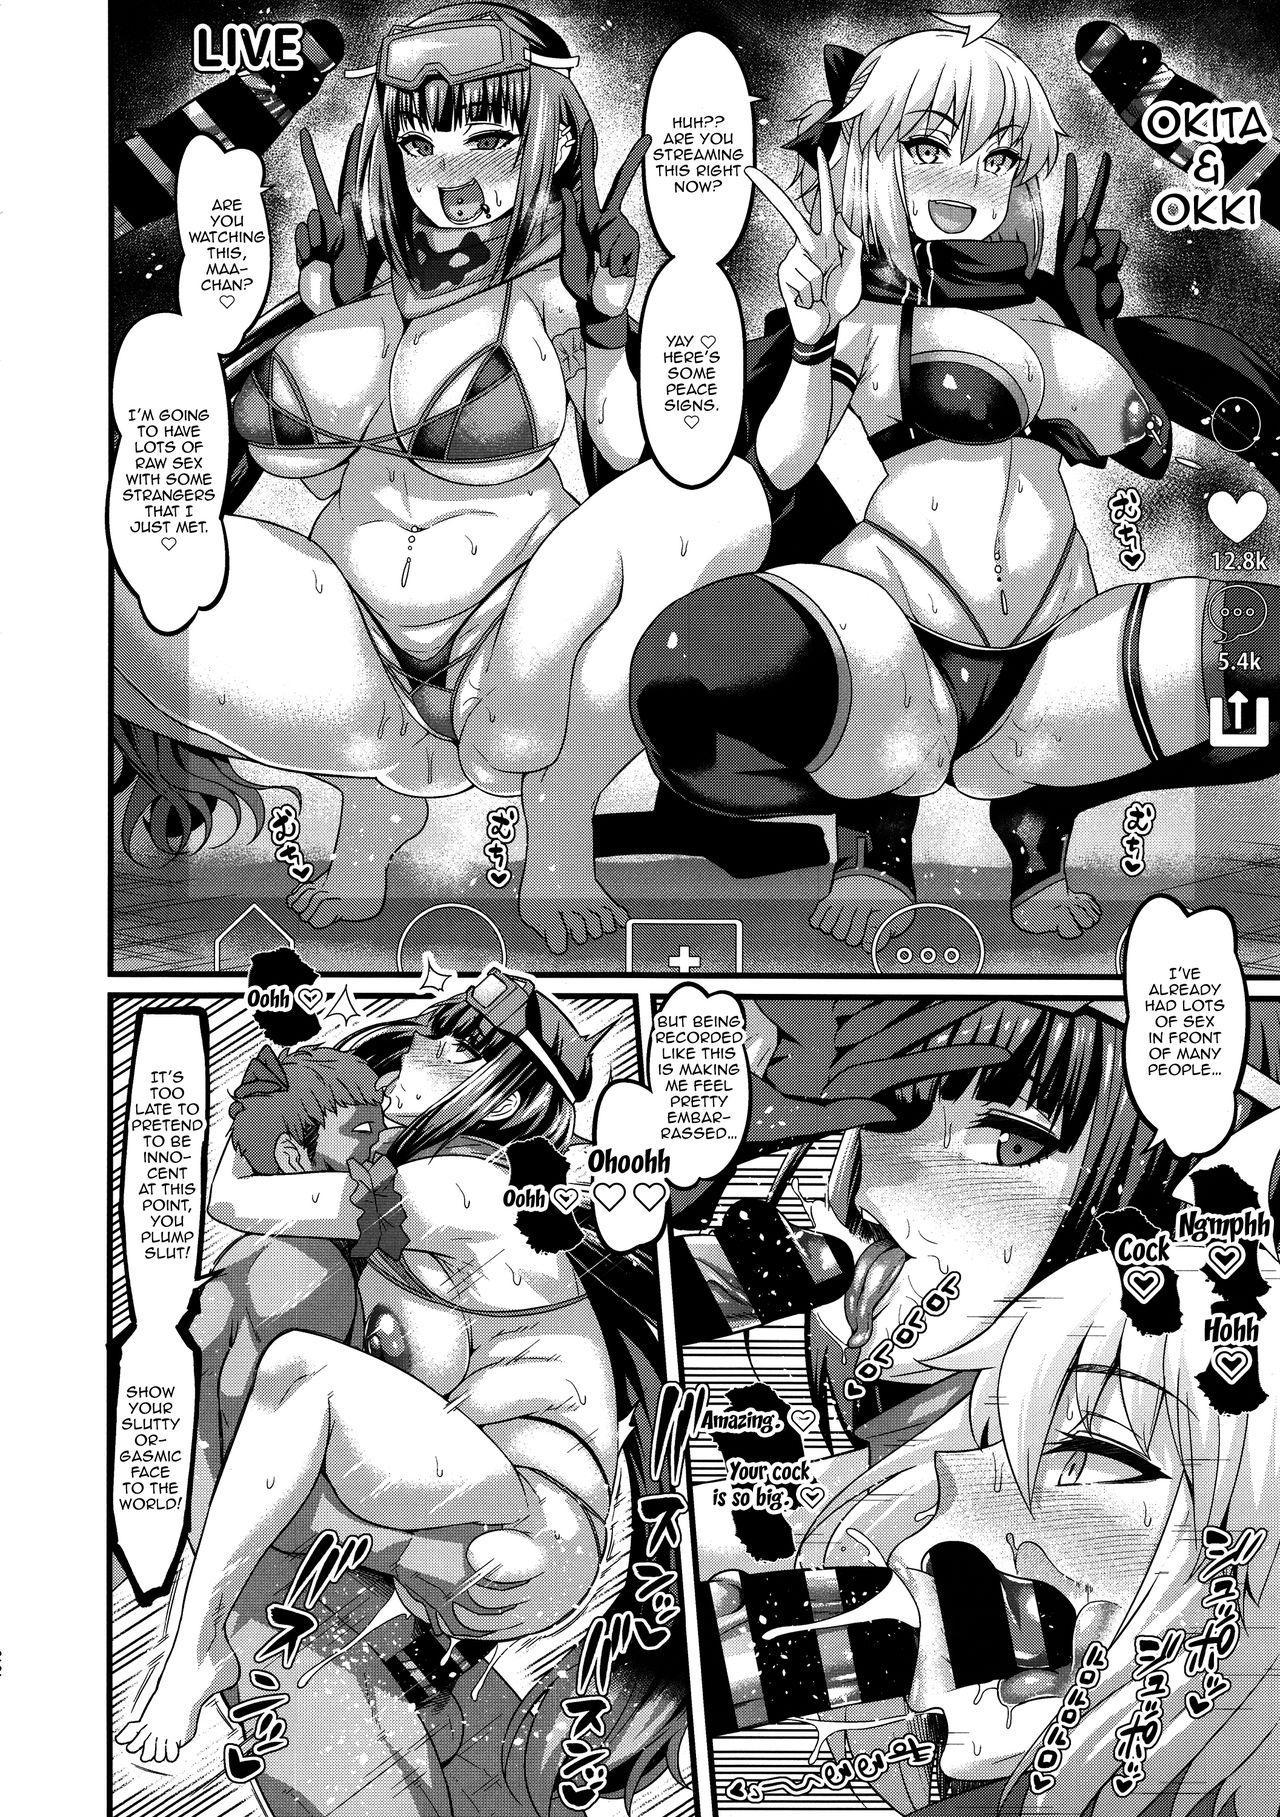 Las Vegas Bitch Kengou Sex Nanairo Shoubu   The Seven Colored Duels of the Slutty Swordmasters in Las Vegas 20